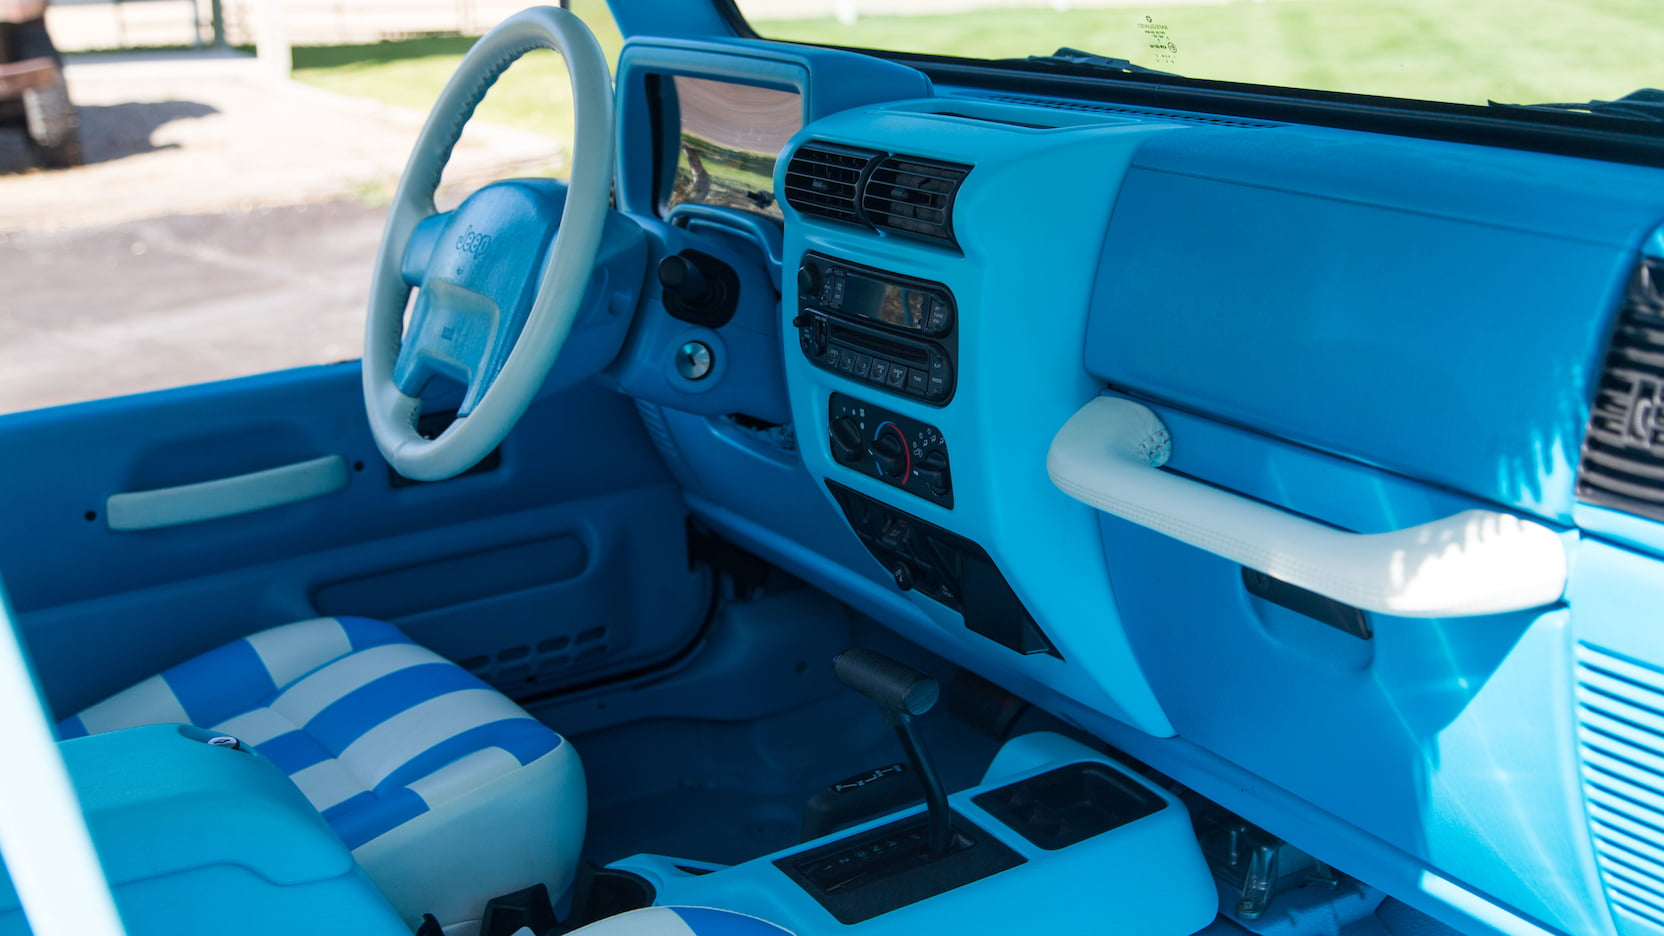 2004 Jeep Wrangler interior passenger